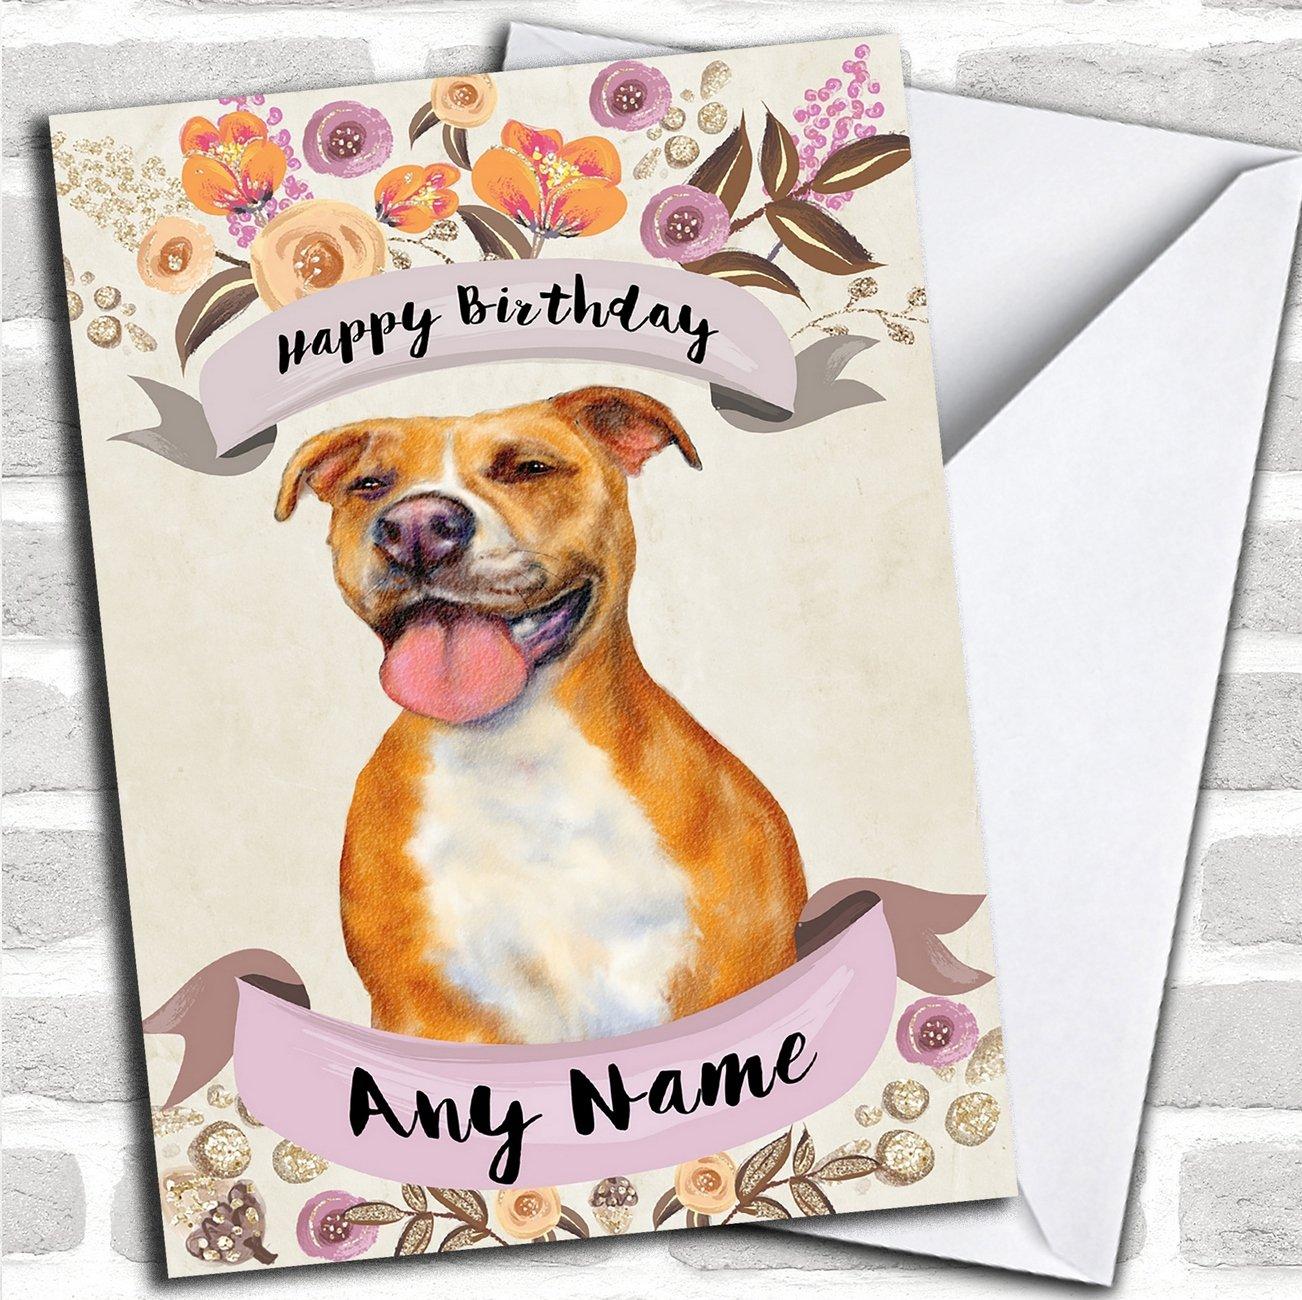 Amazon.com : Rustic Gold Dog Pitbull Personalized Birthday Card ...